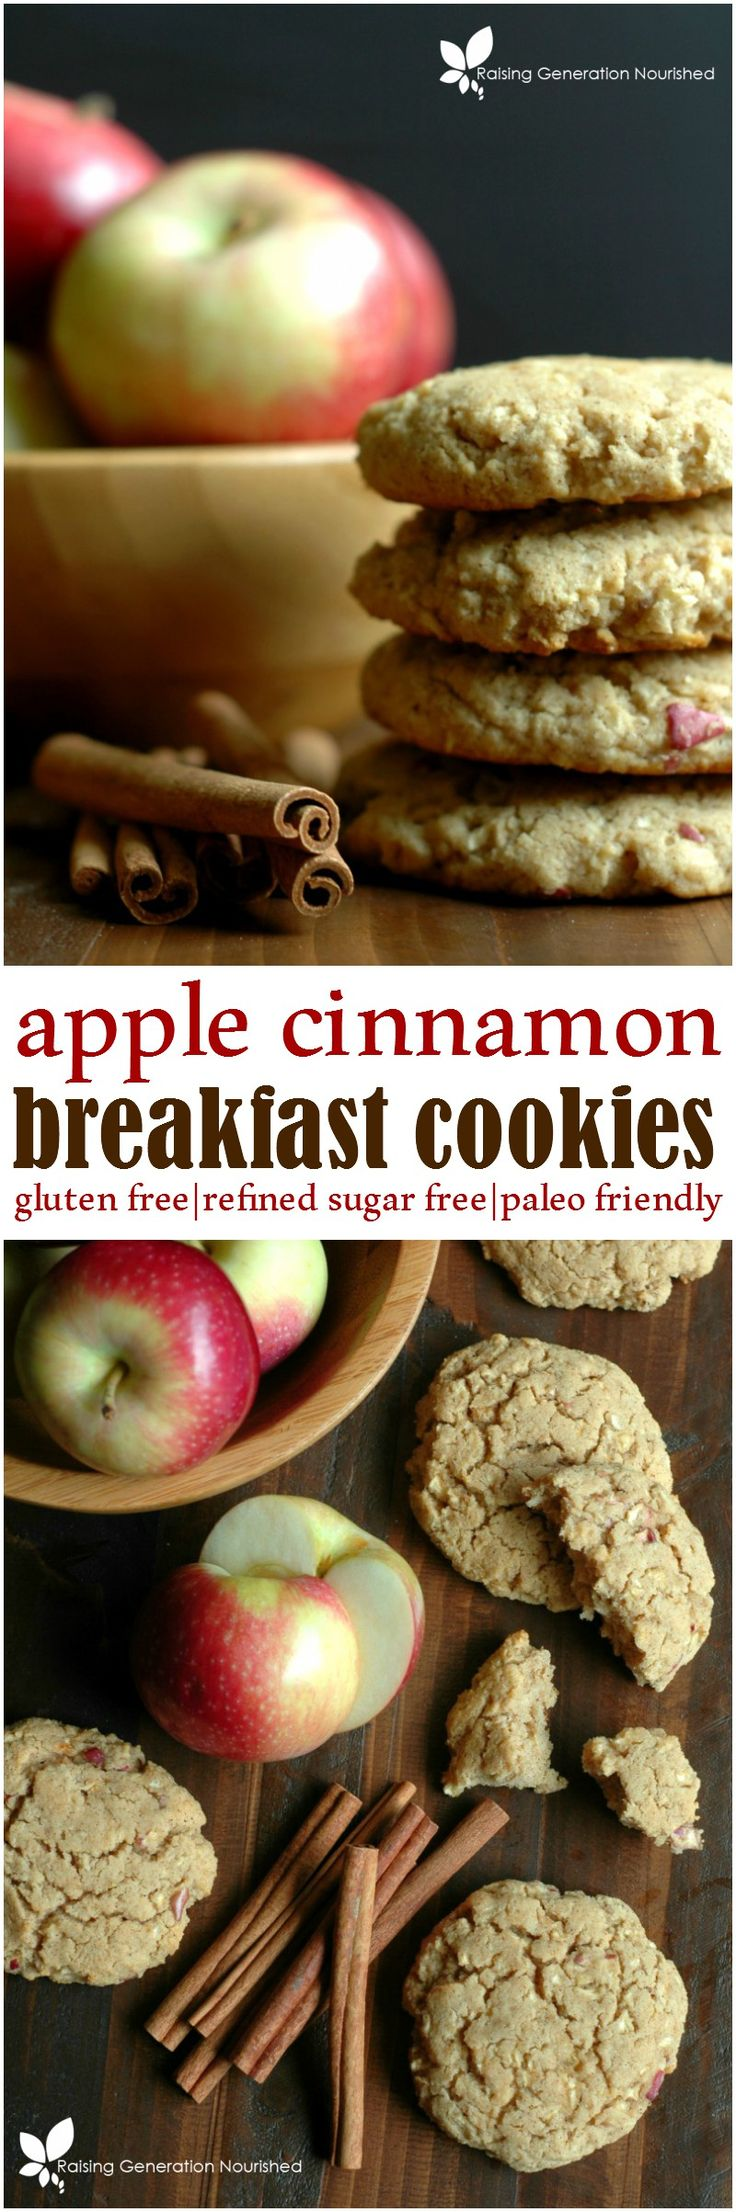 Healthy Apple Cinnamon Breakfast Cookies :: Refined Sugar Free & Gluten Free